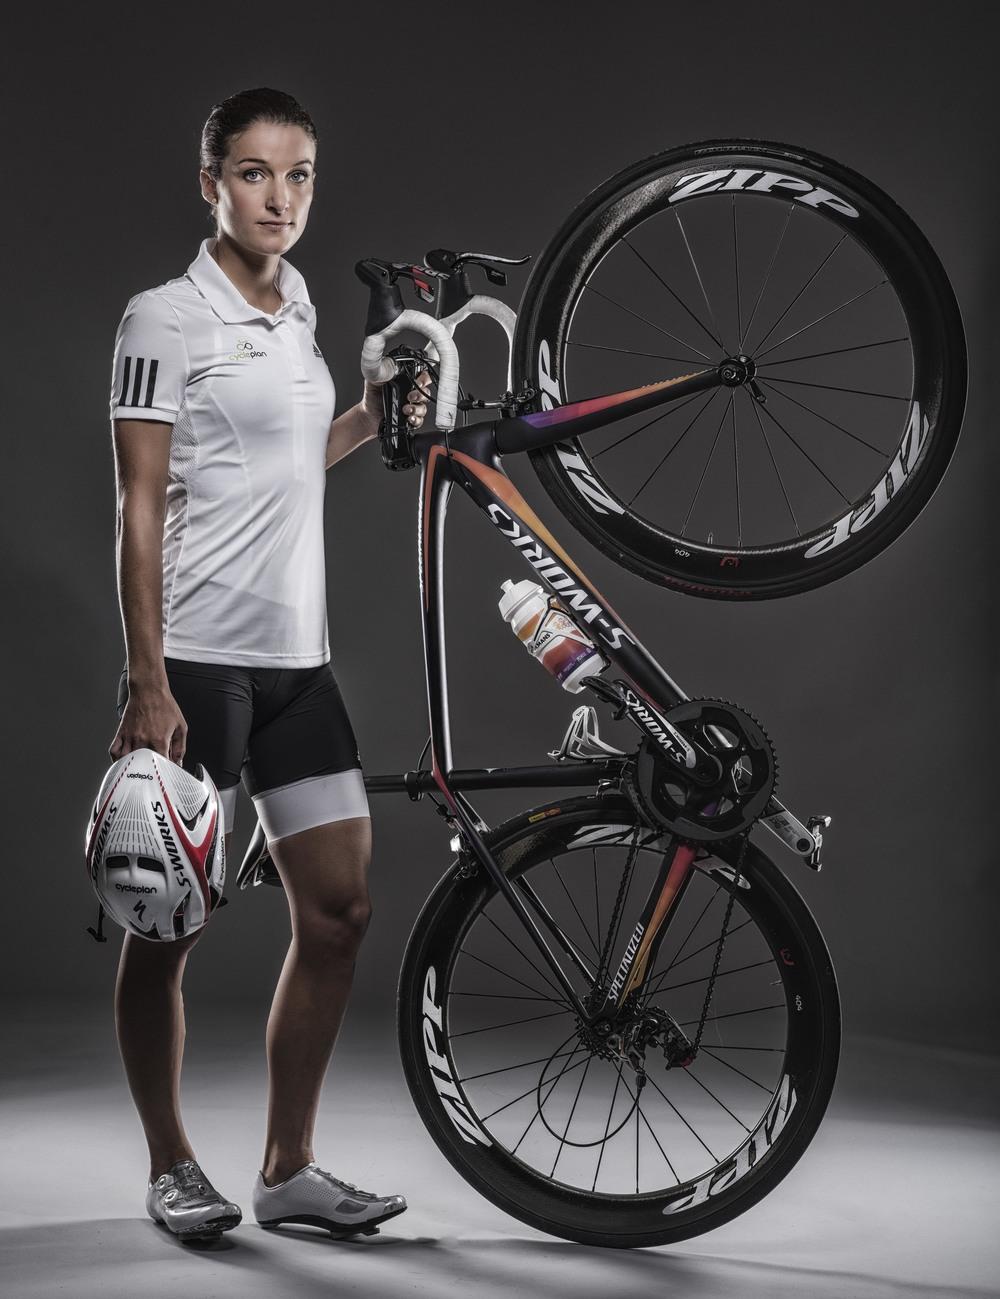 CYCLIST LIZZIE ARMISTEAD PHOTO CREDIT PAUL COOPER/PCOOPERPHOTO.COM